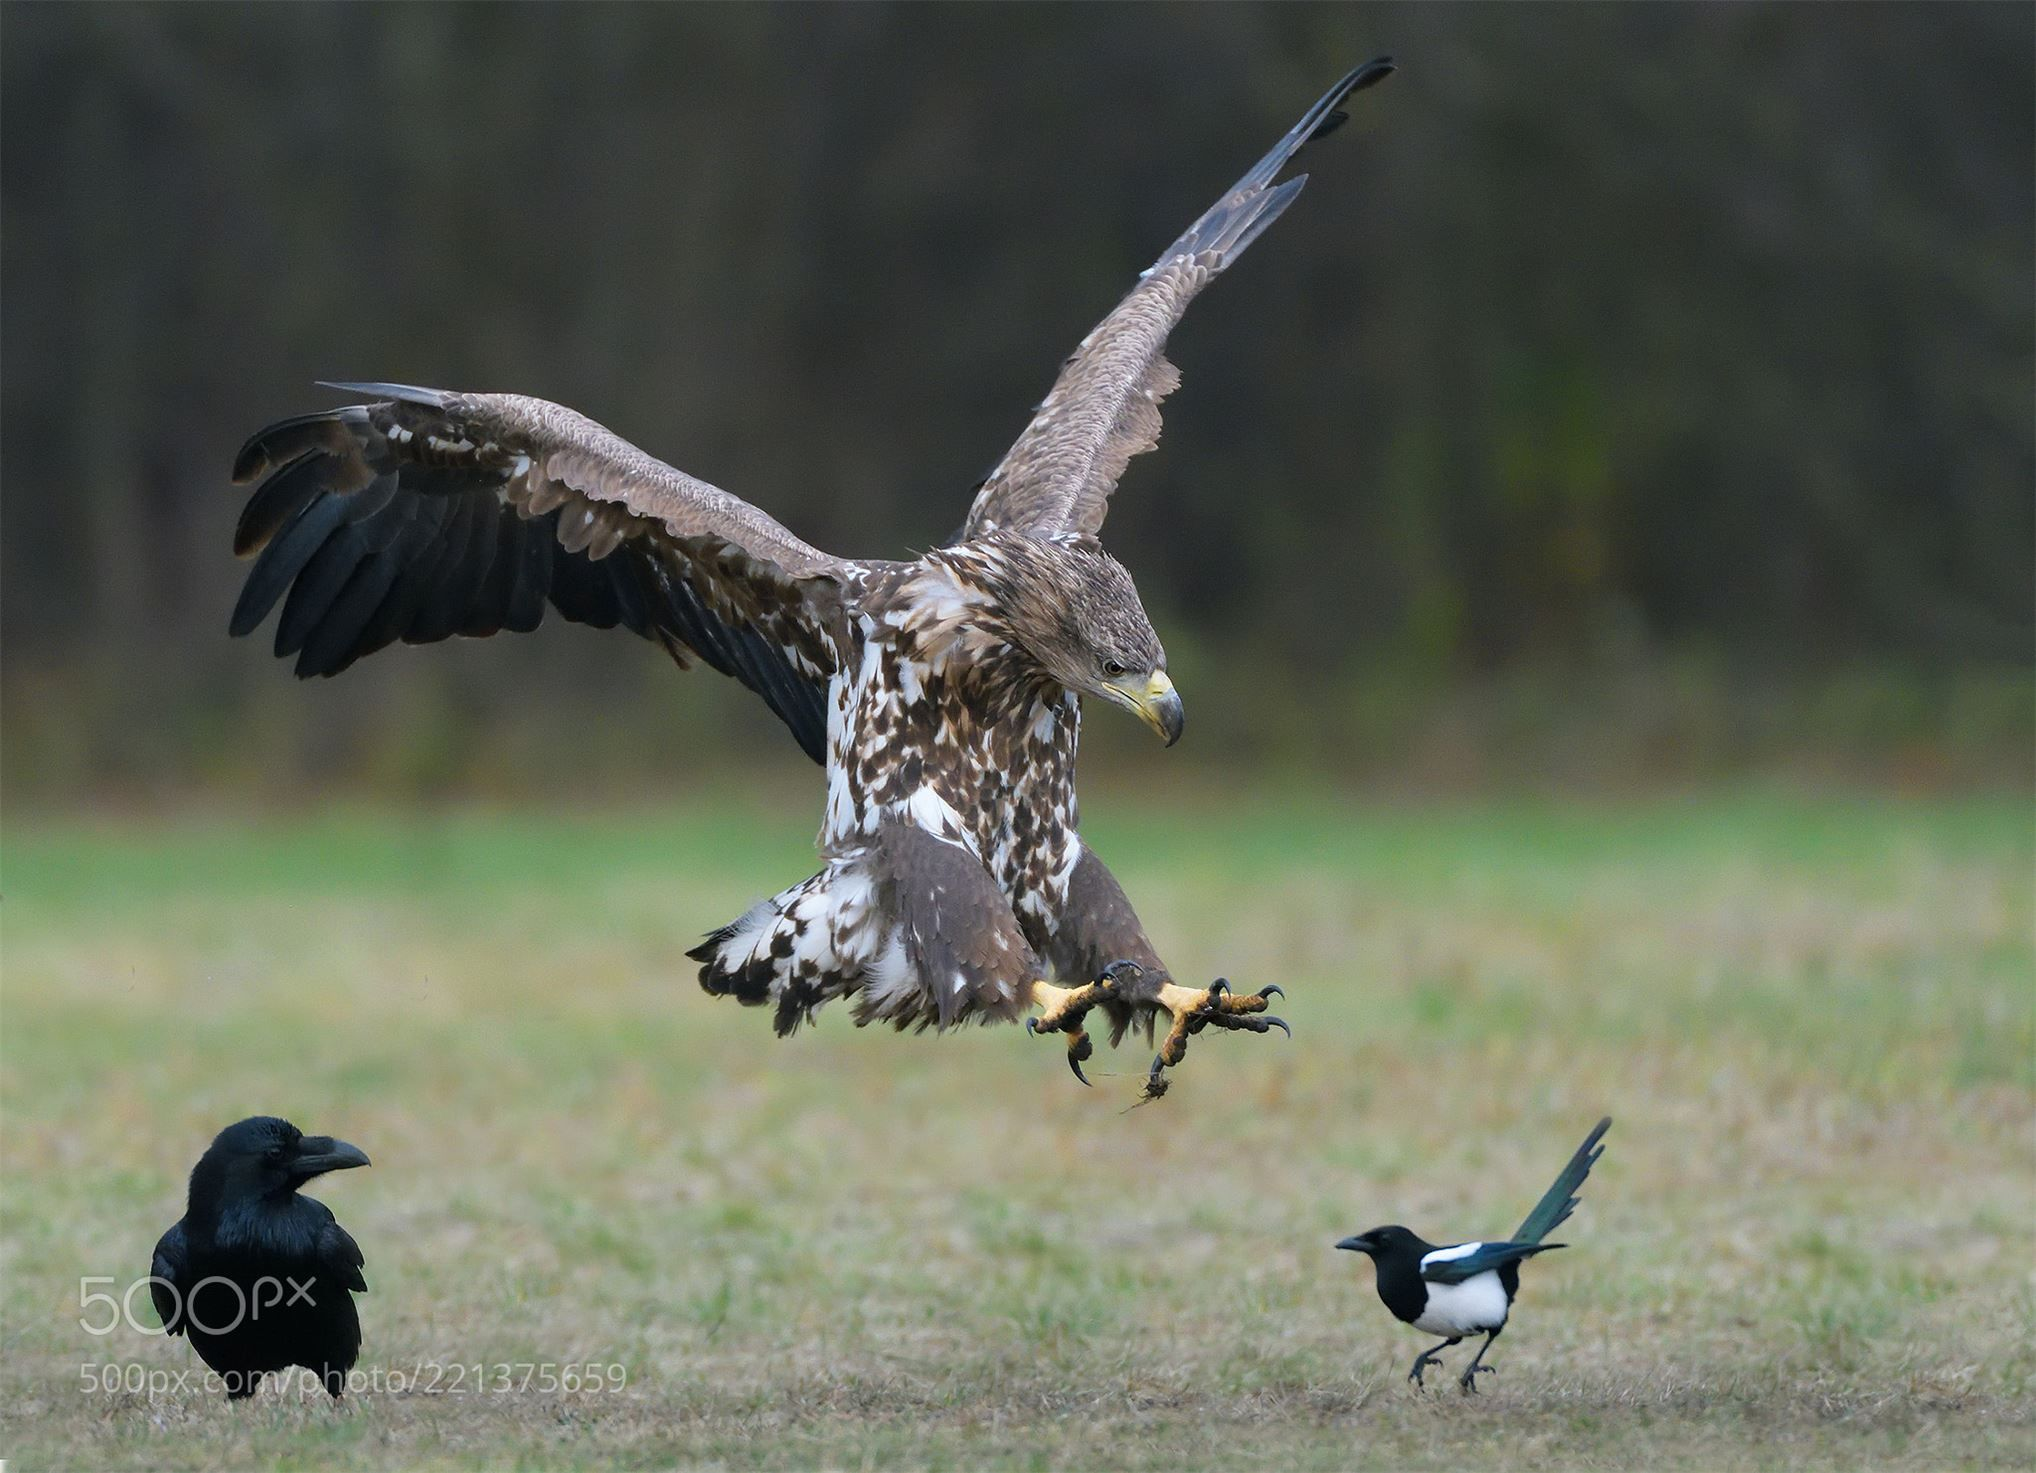 Tricky Situation (Harry  Eggens / Groningen / Netherlands) #NIKON D500 #animals #photo #nature